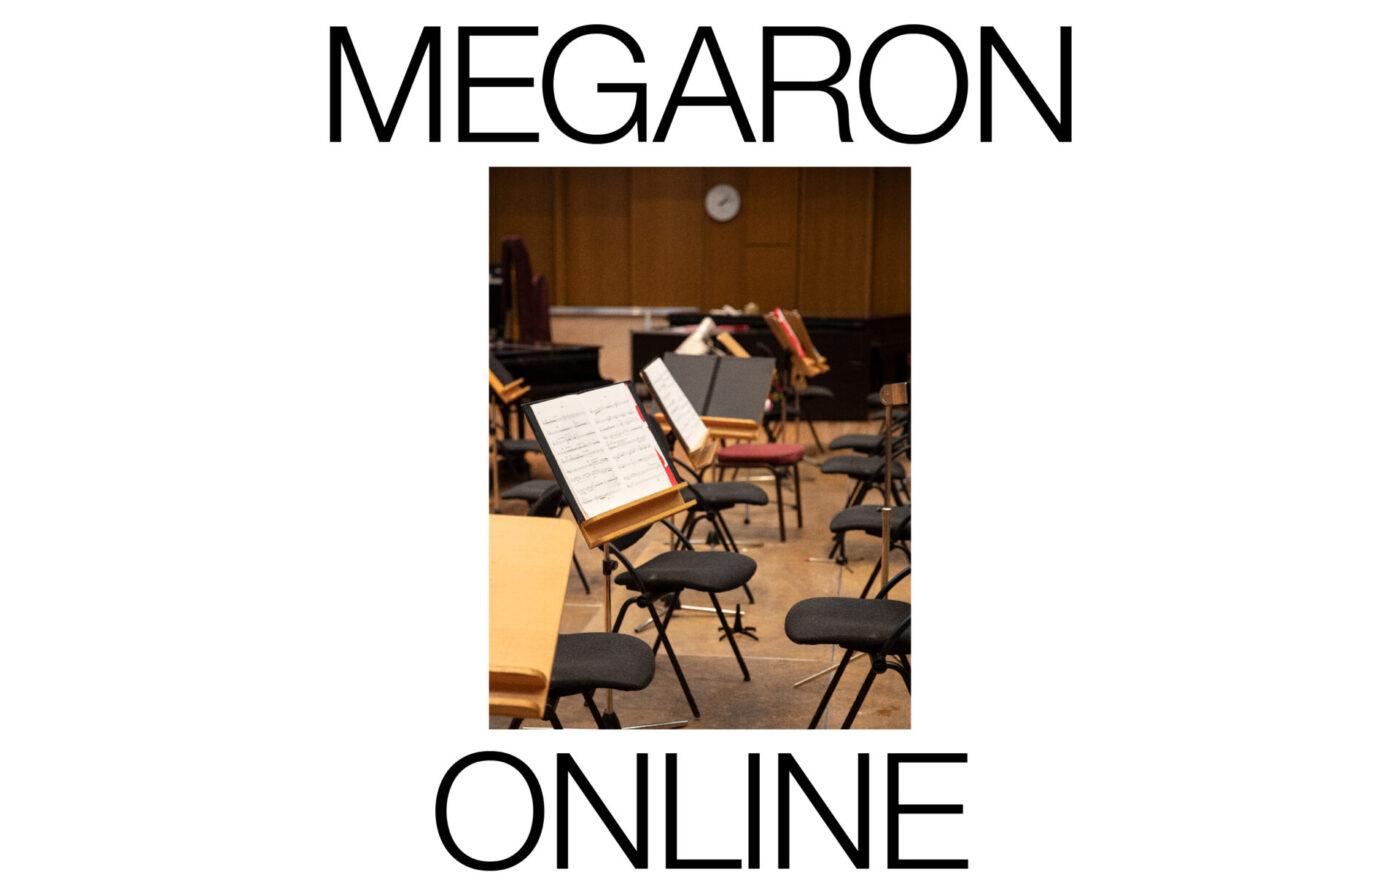 MMA_Megaron Online_Carousel-01